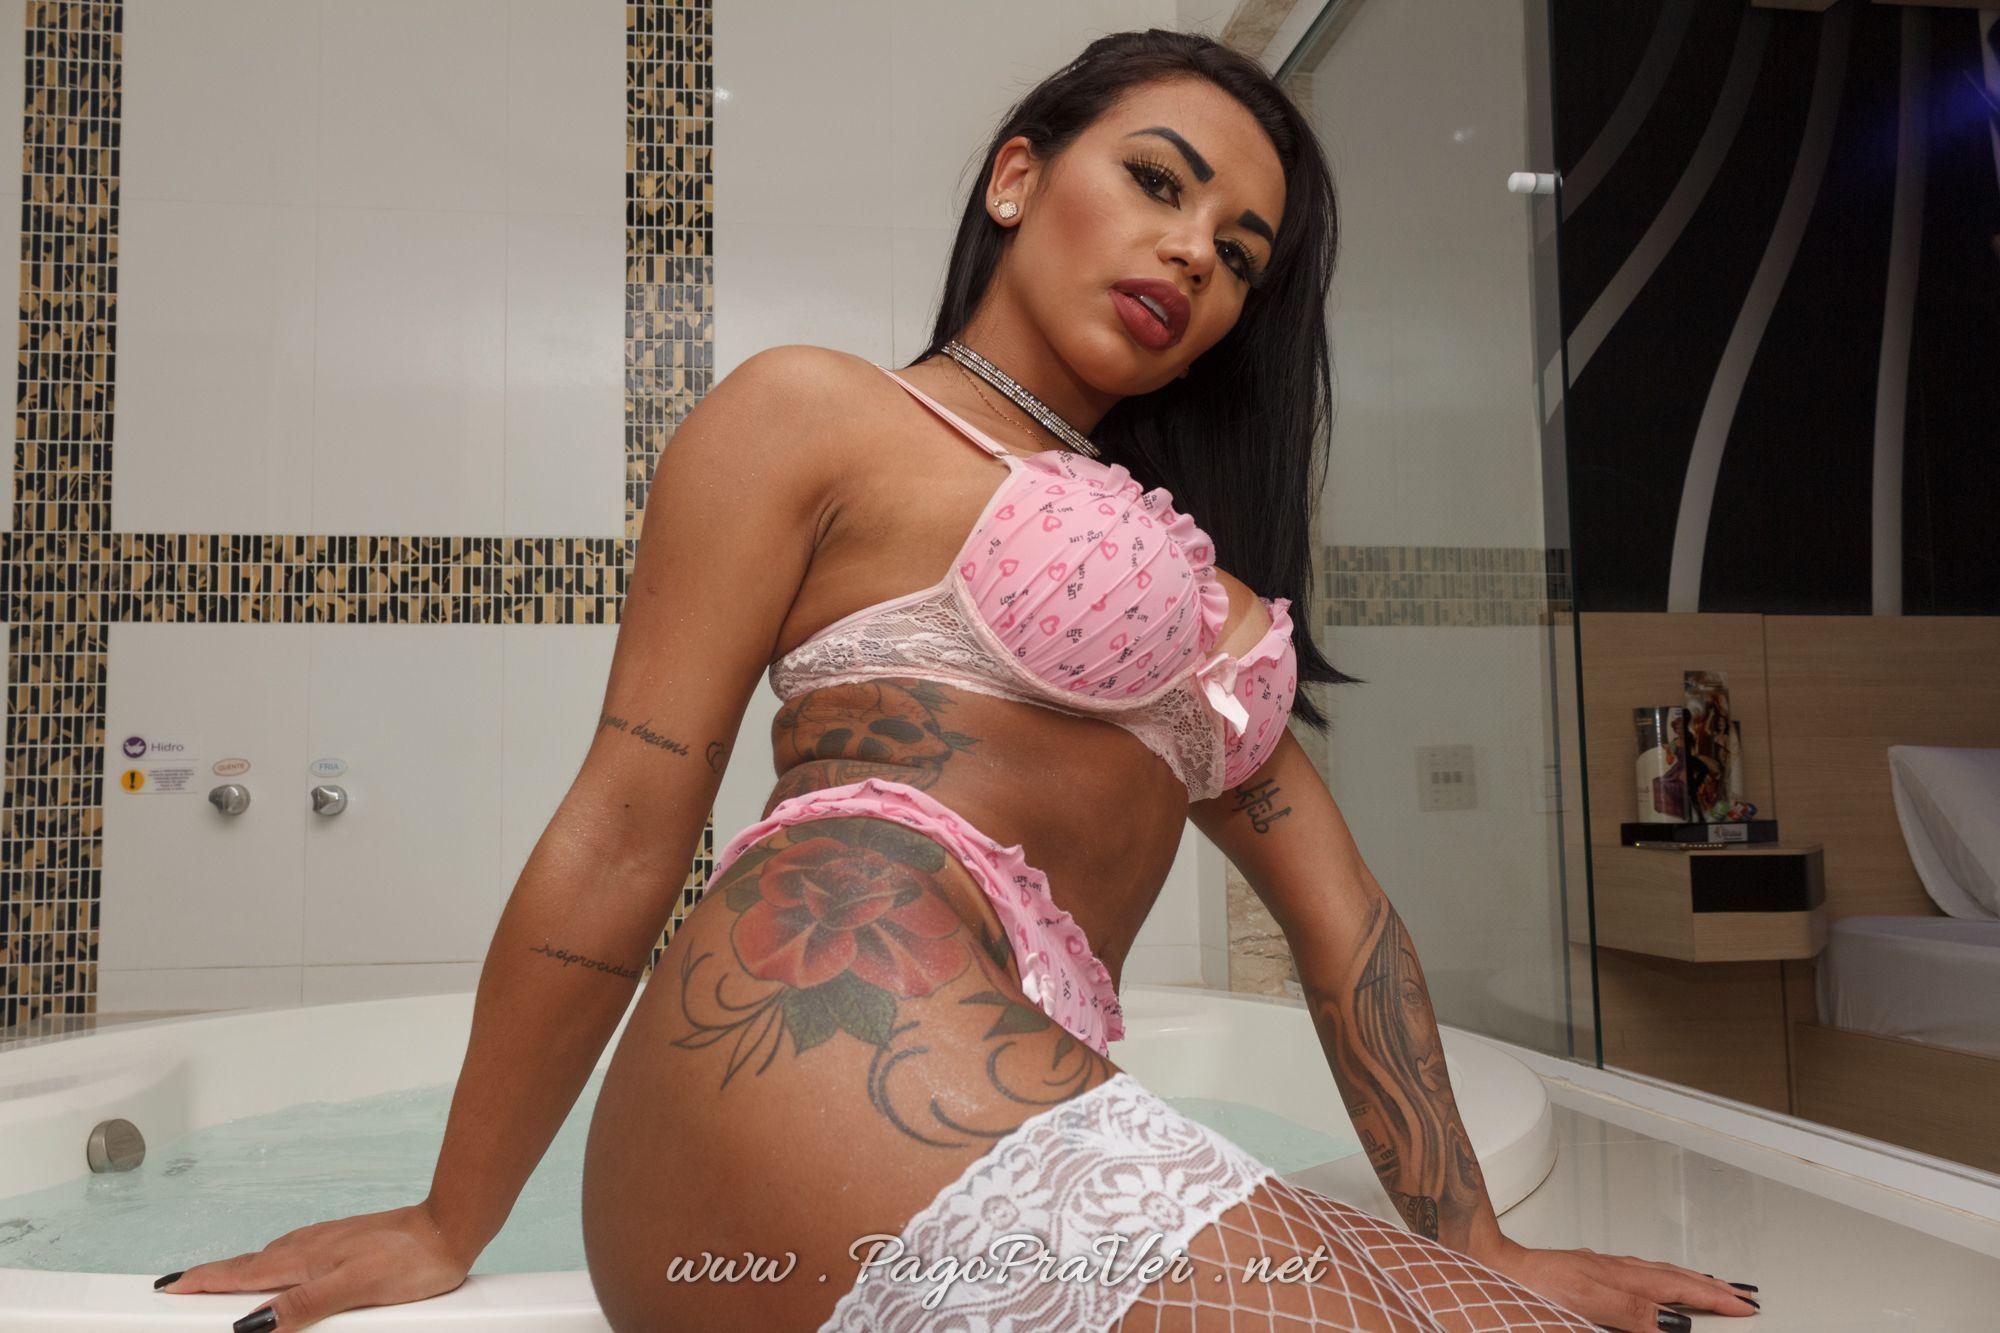 @pattysanxess lingerie na banheira